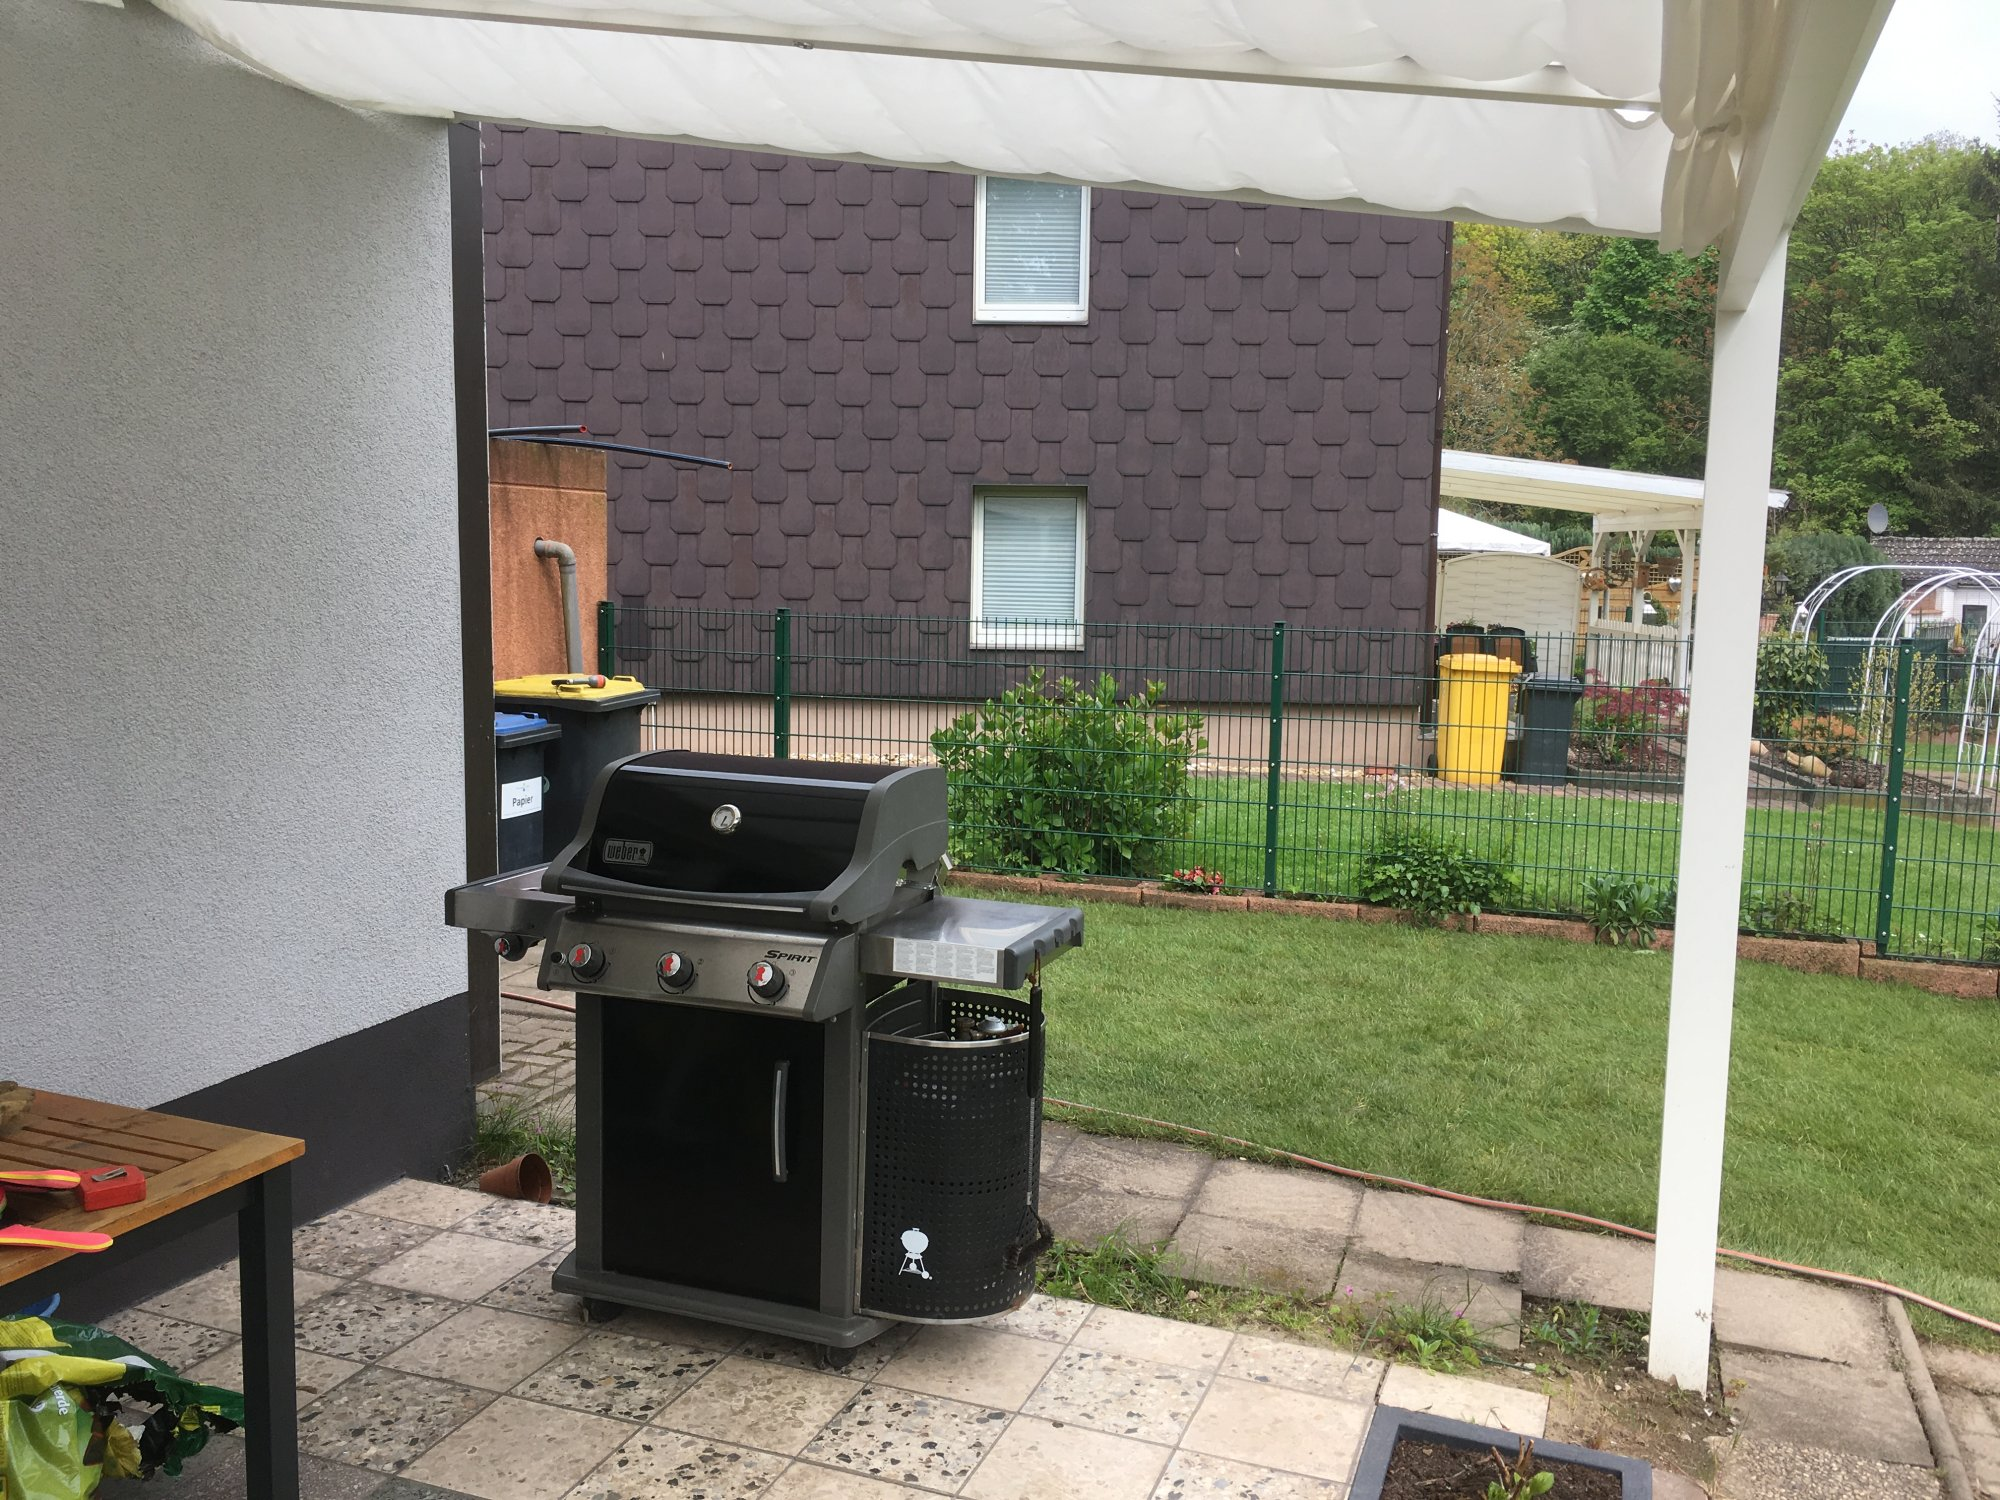 Weber Outdoor Küche Vergleich : Weber grill möbelhof adersheim